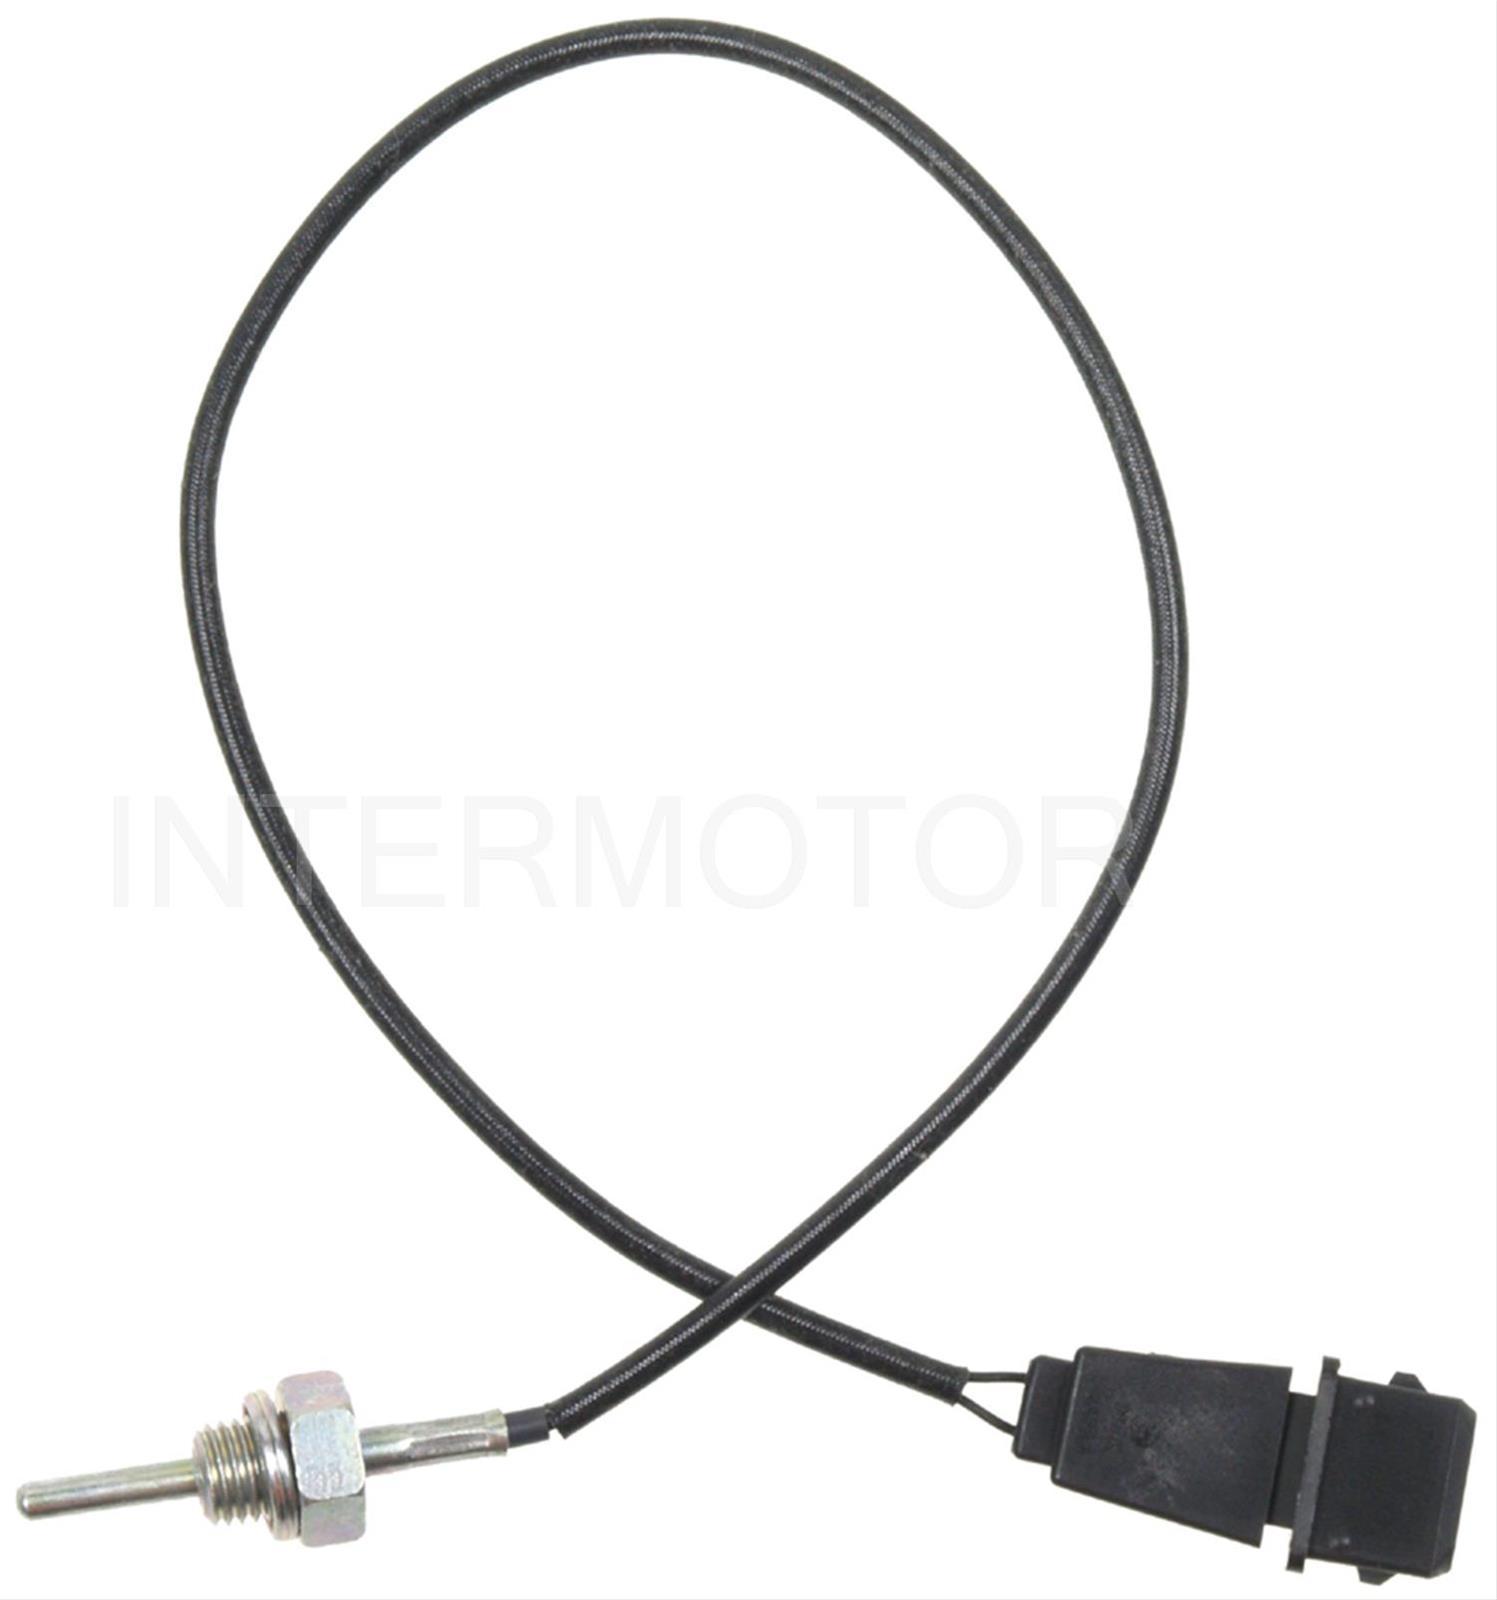 Standard Motor Products TX130 Coolant Temperature Sender